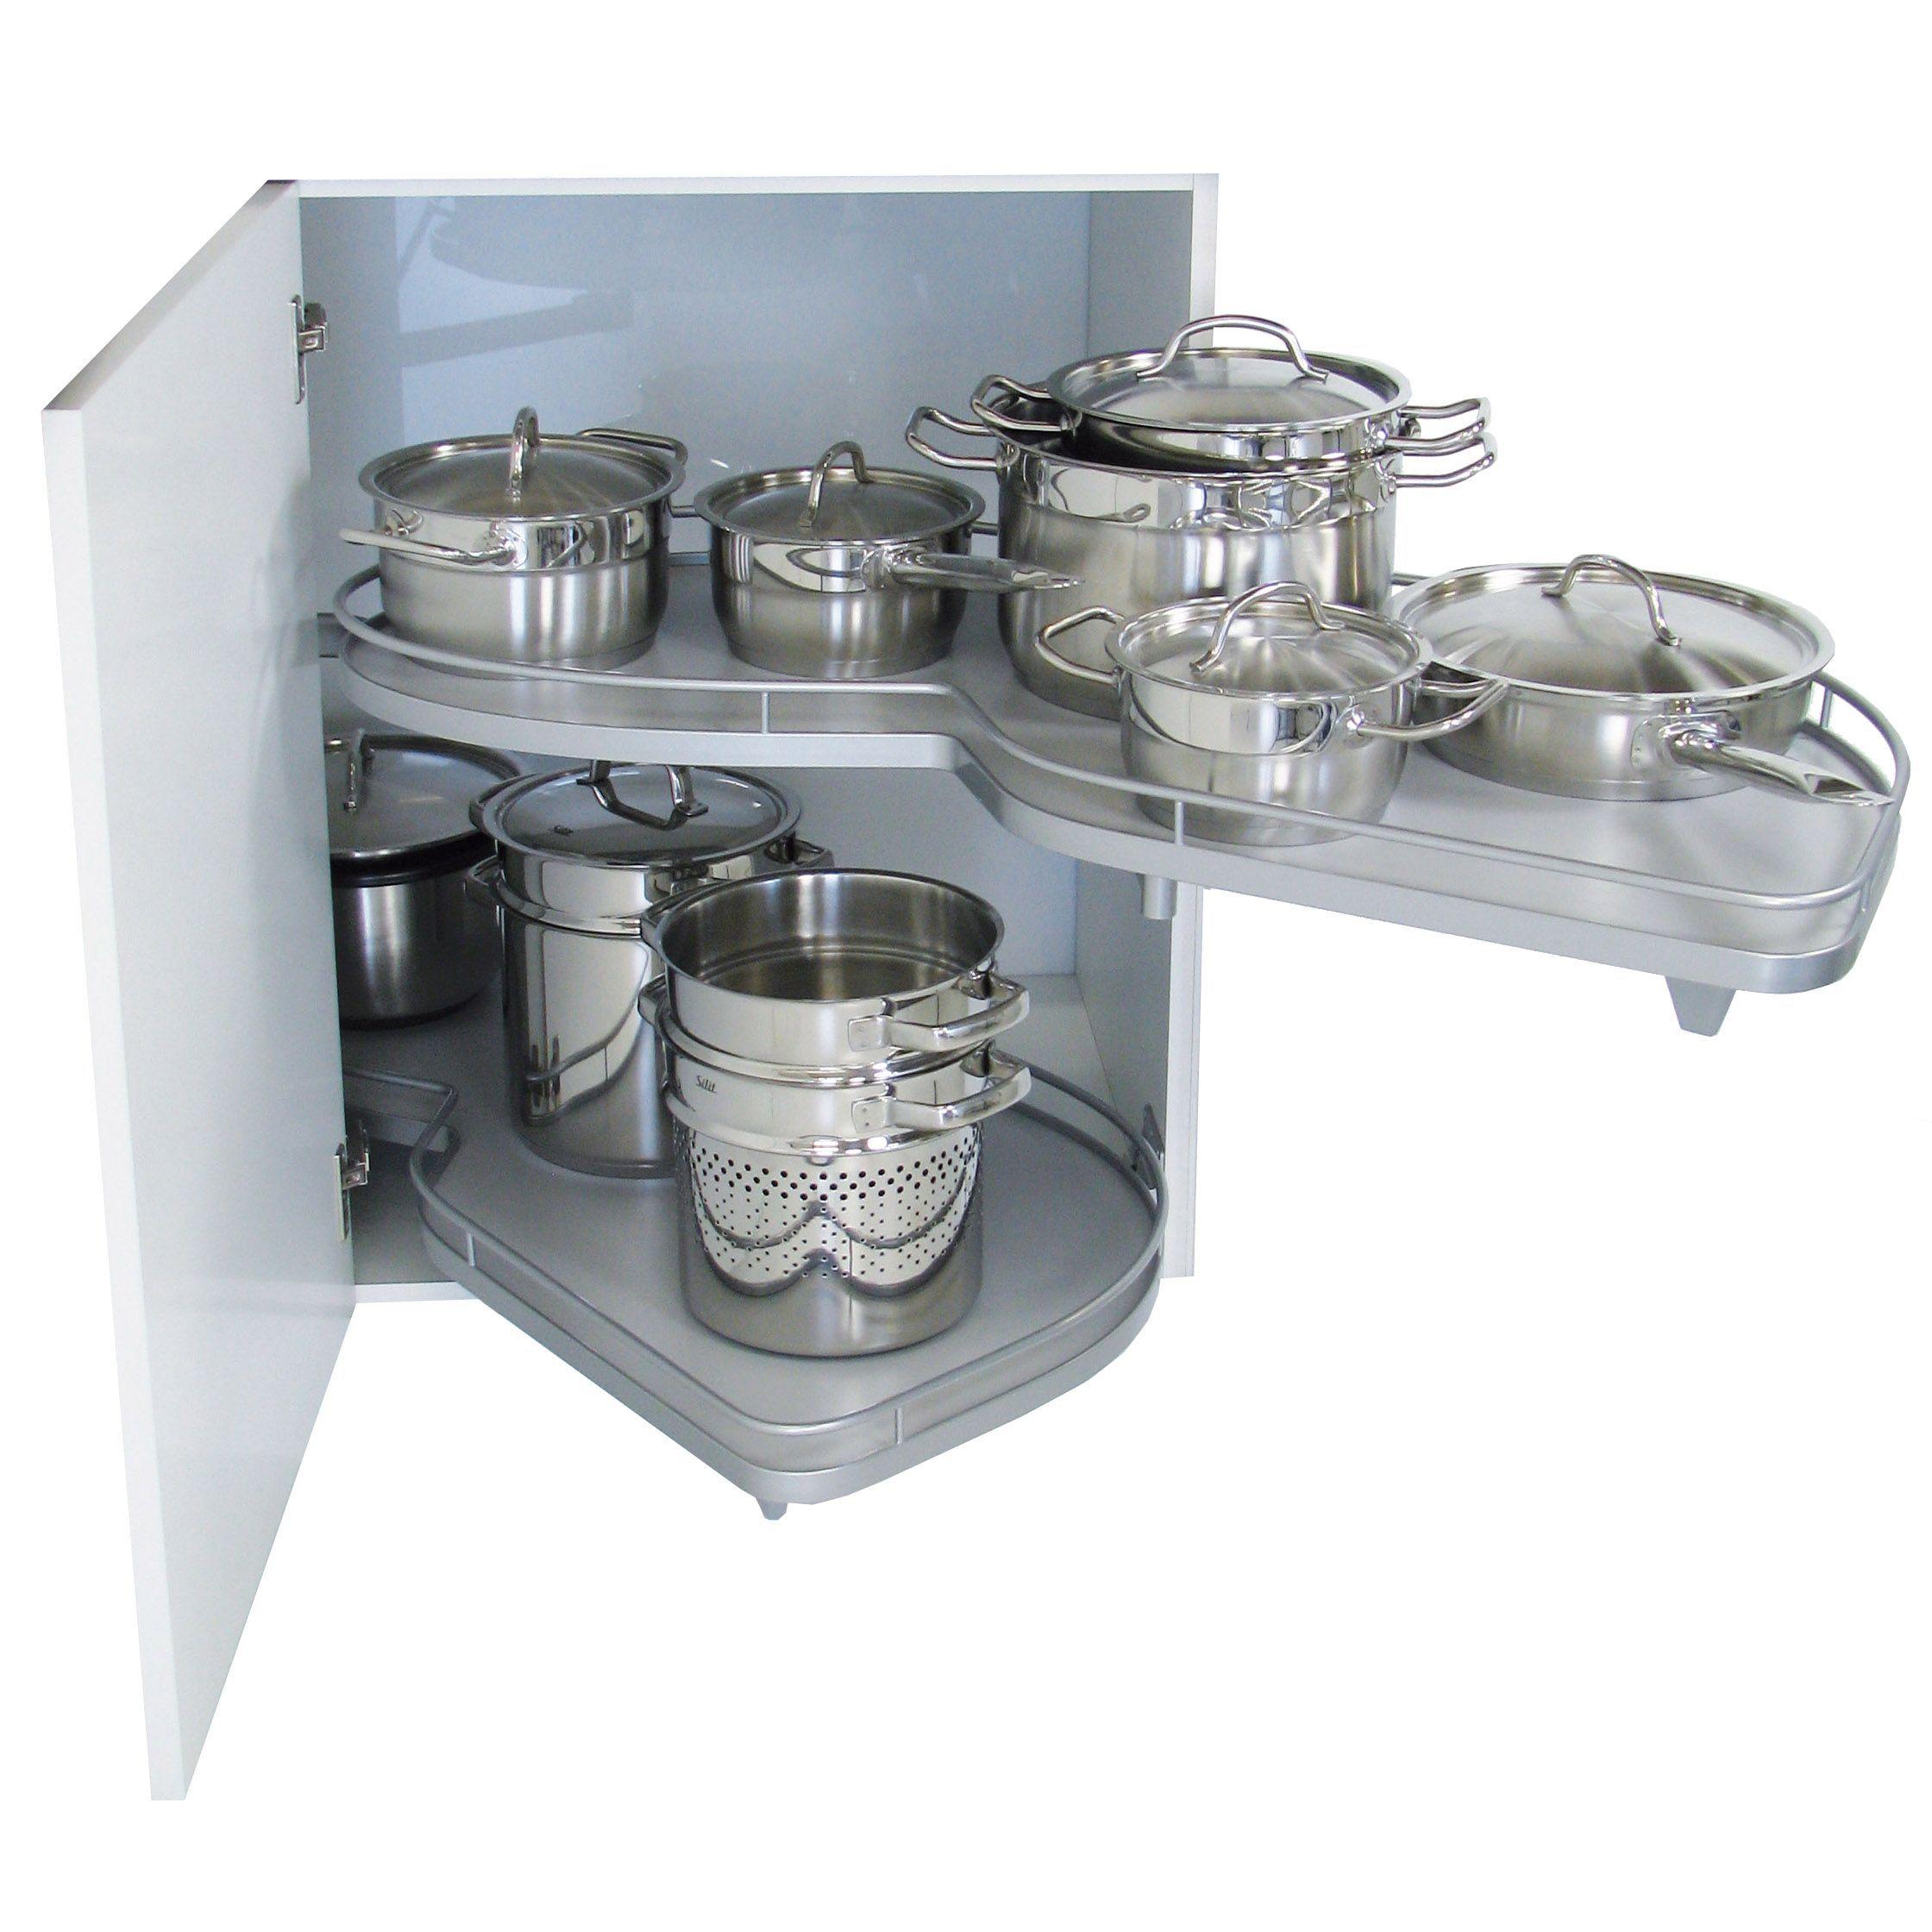 Kesseb hmer rh lemans corner cabinet storage 1000mm for Kitchen cabinets 1000mm